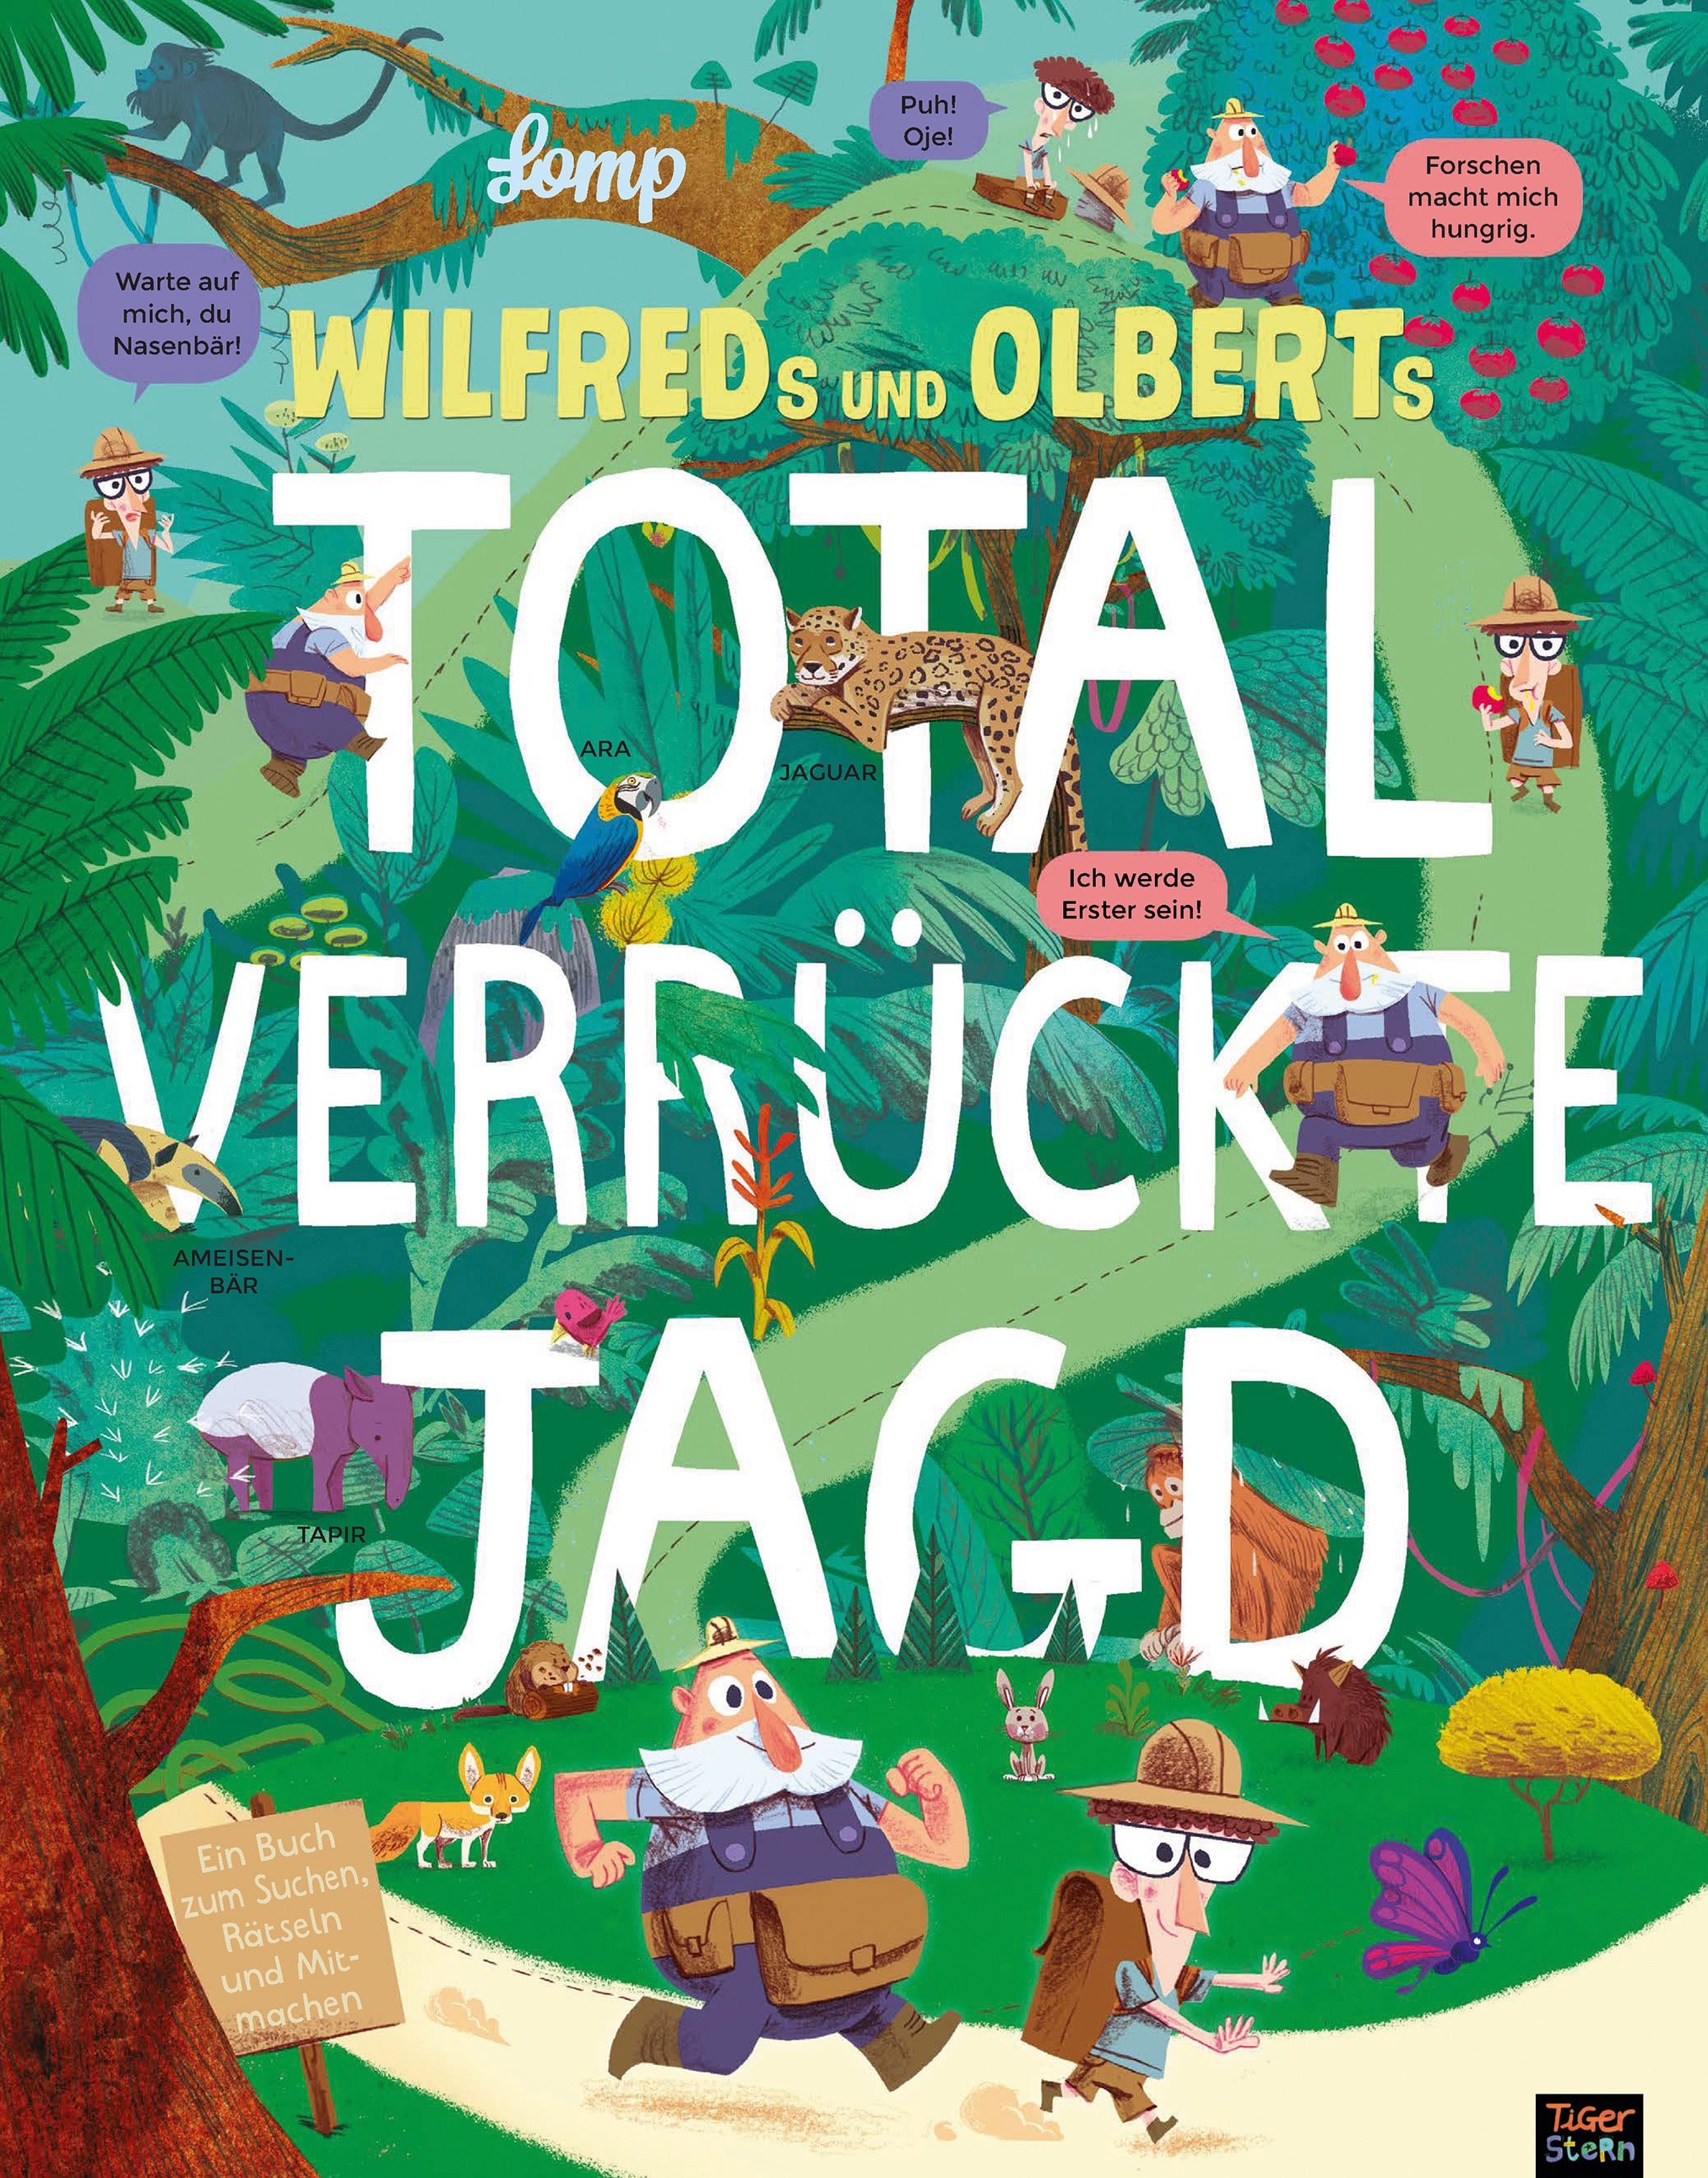 Wilfrieds und Olberts total verrückte Jagd